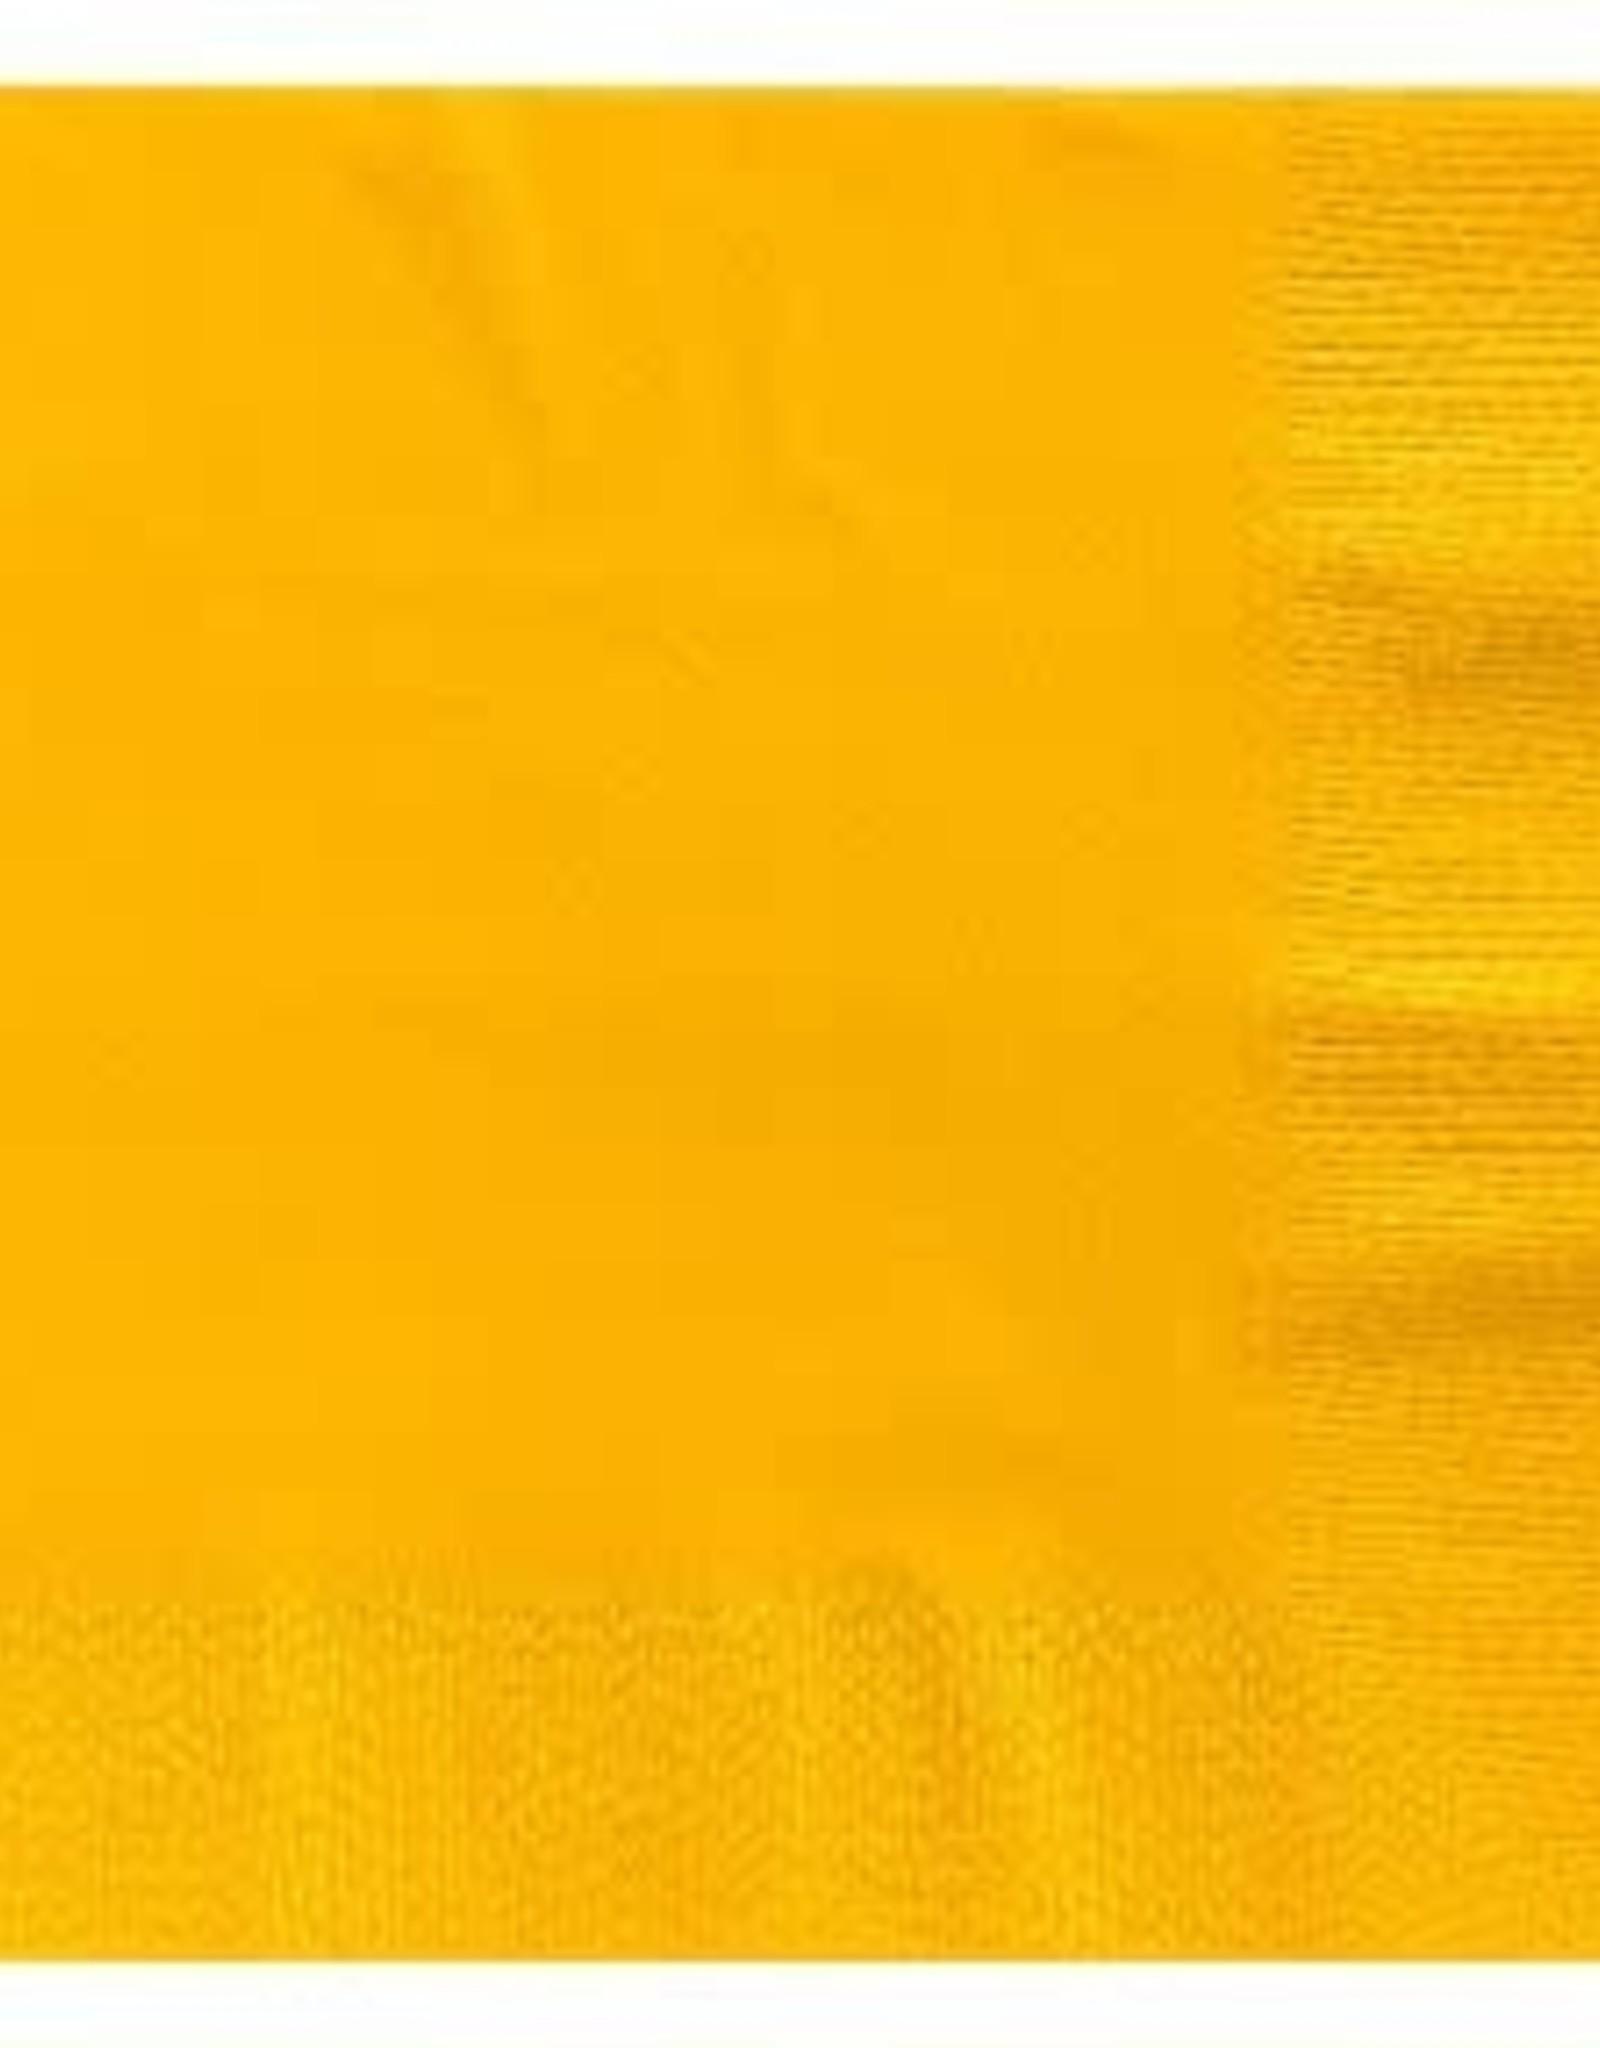 Yellow Sunshine Cocktail Napkin 20 ct